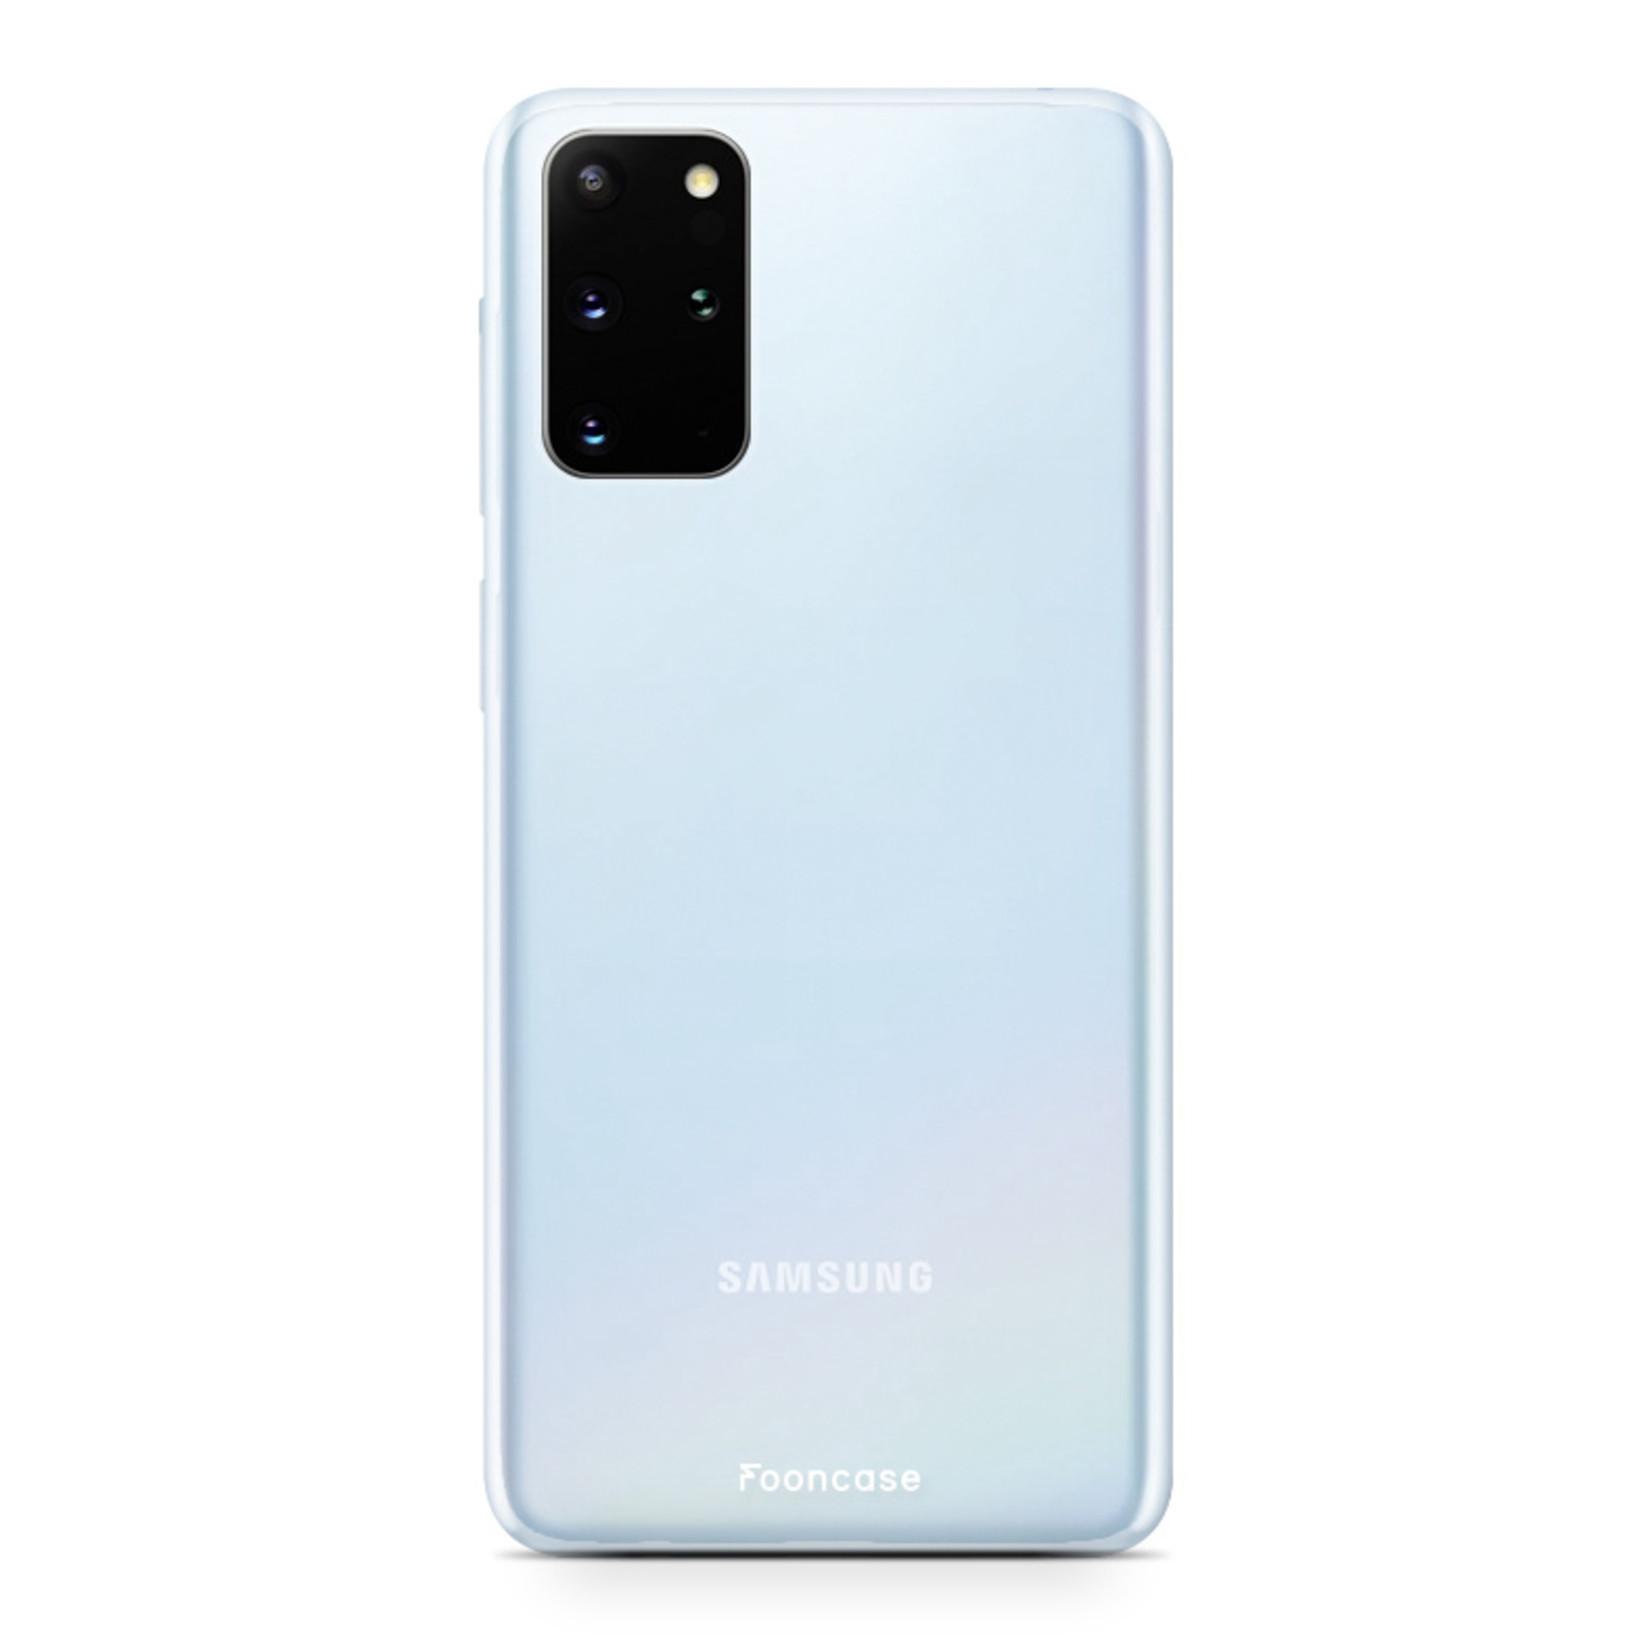 FOONCASE Samsung Galaxy S20 FE hoesje TPU Soft Case - Back Cover - Transparant / Doorzichtig